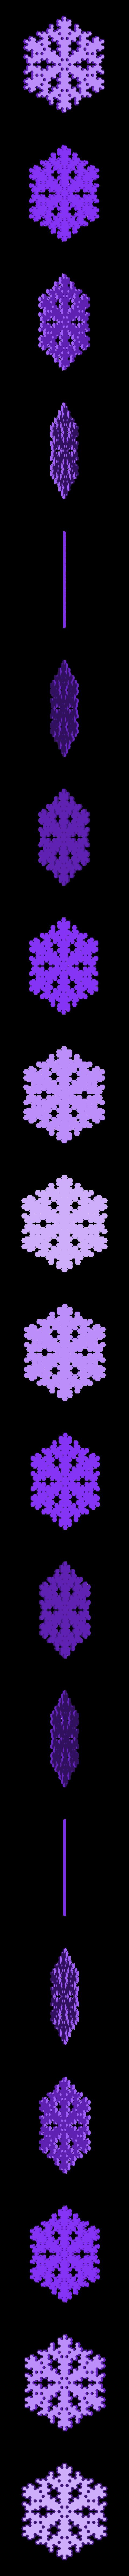 reiter-var3.stl Download free STL file Snowflake growth simulation in BlocksCAD • 3D printing design, arpruss